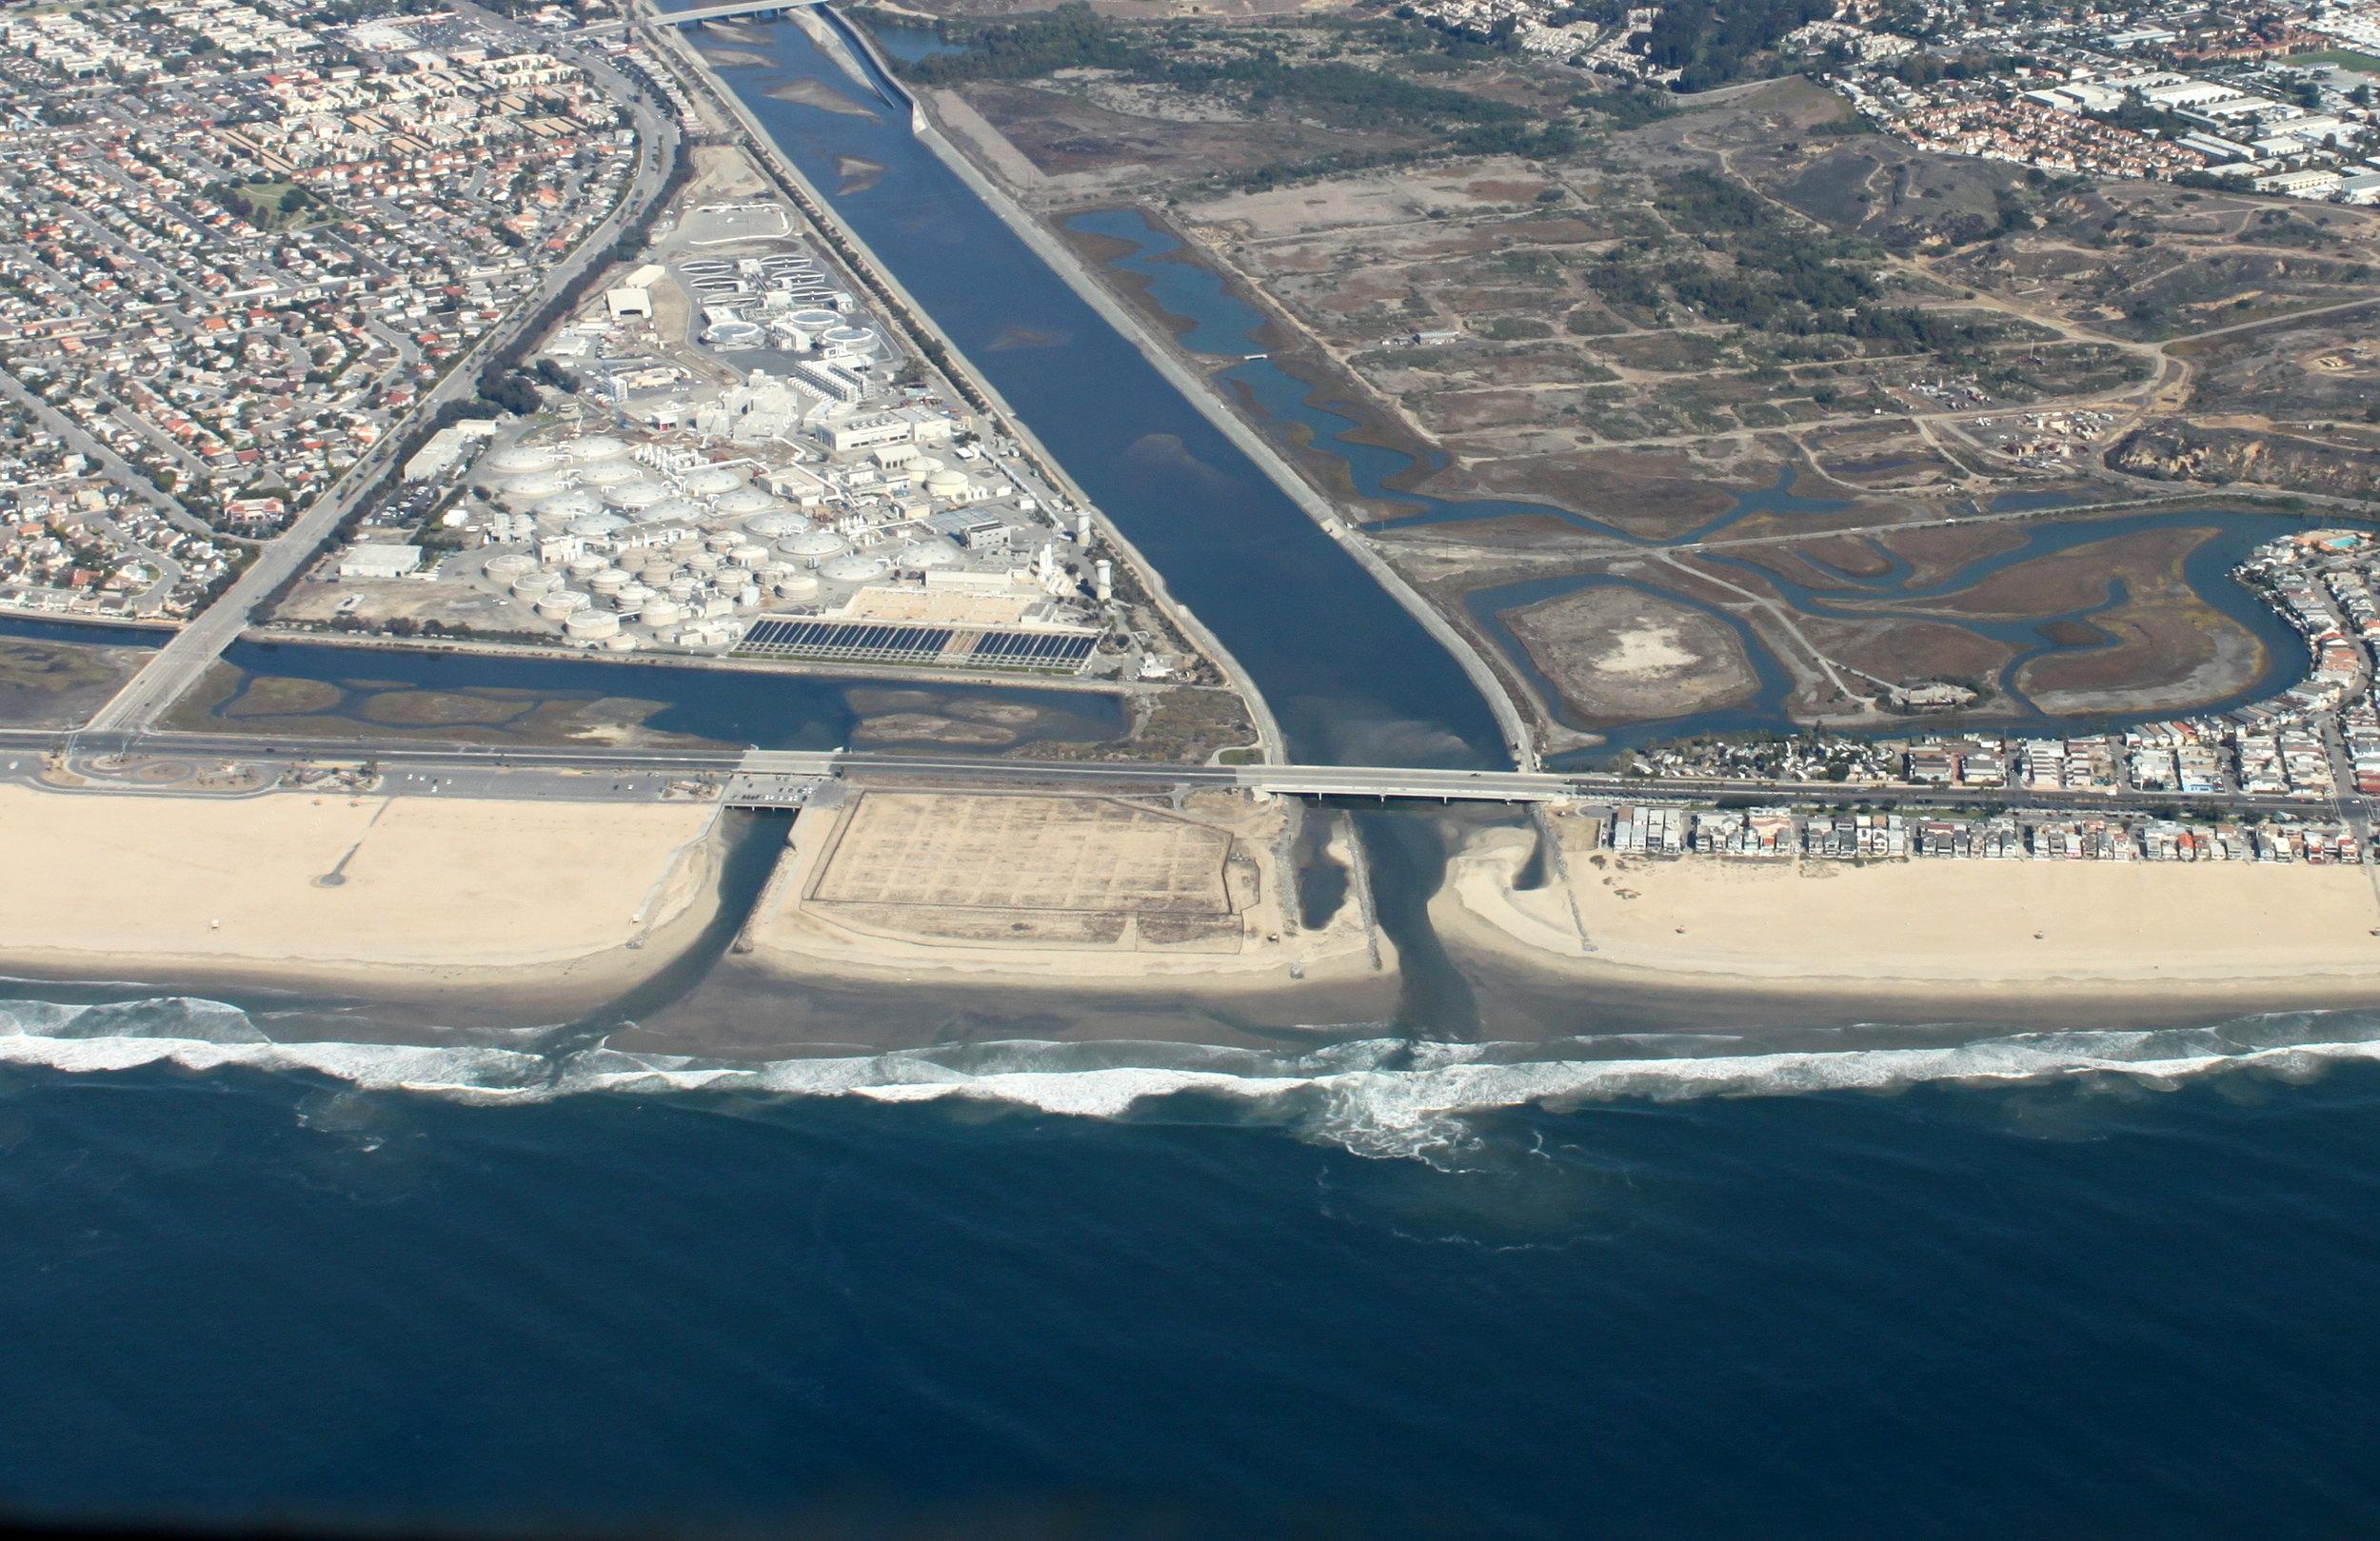 Talbert Channel and Santa Ana River Jetties